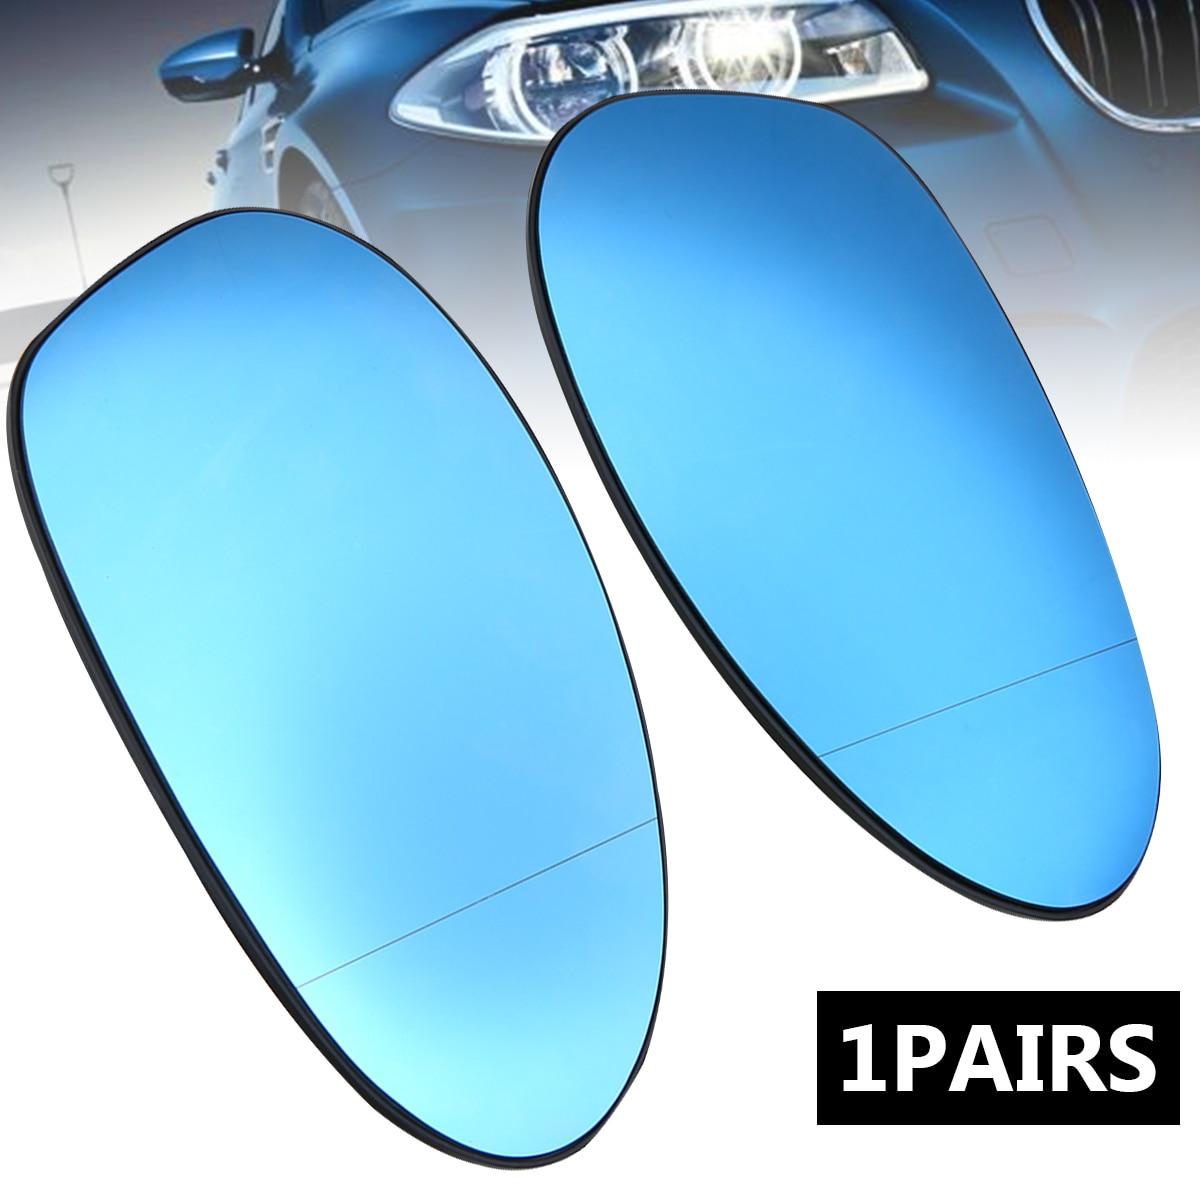 Mayitr 1Pair Door Mirror Glass Heated Blue Tinted Wing Door Mirror Glasses For BMW E82 E90 E91 E92 E46